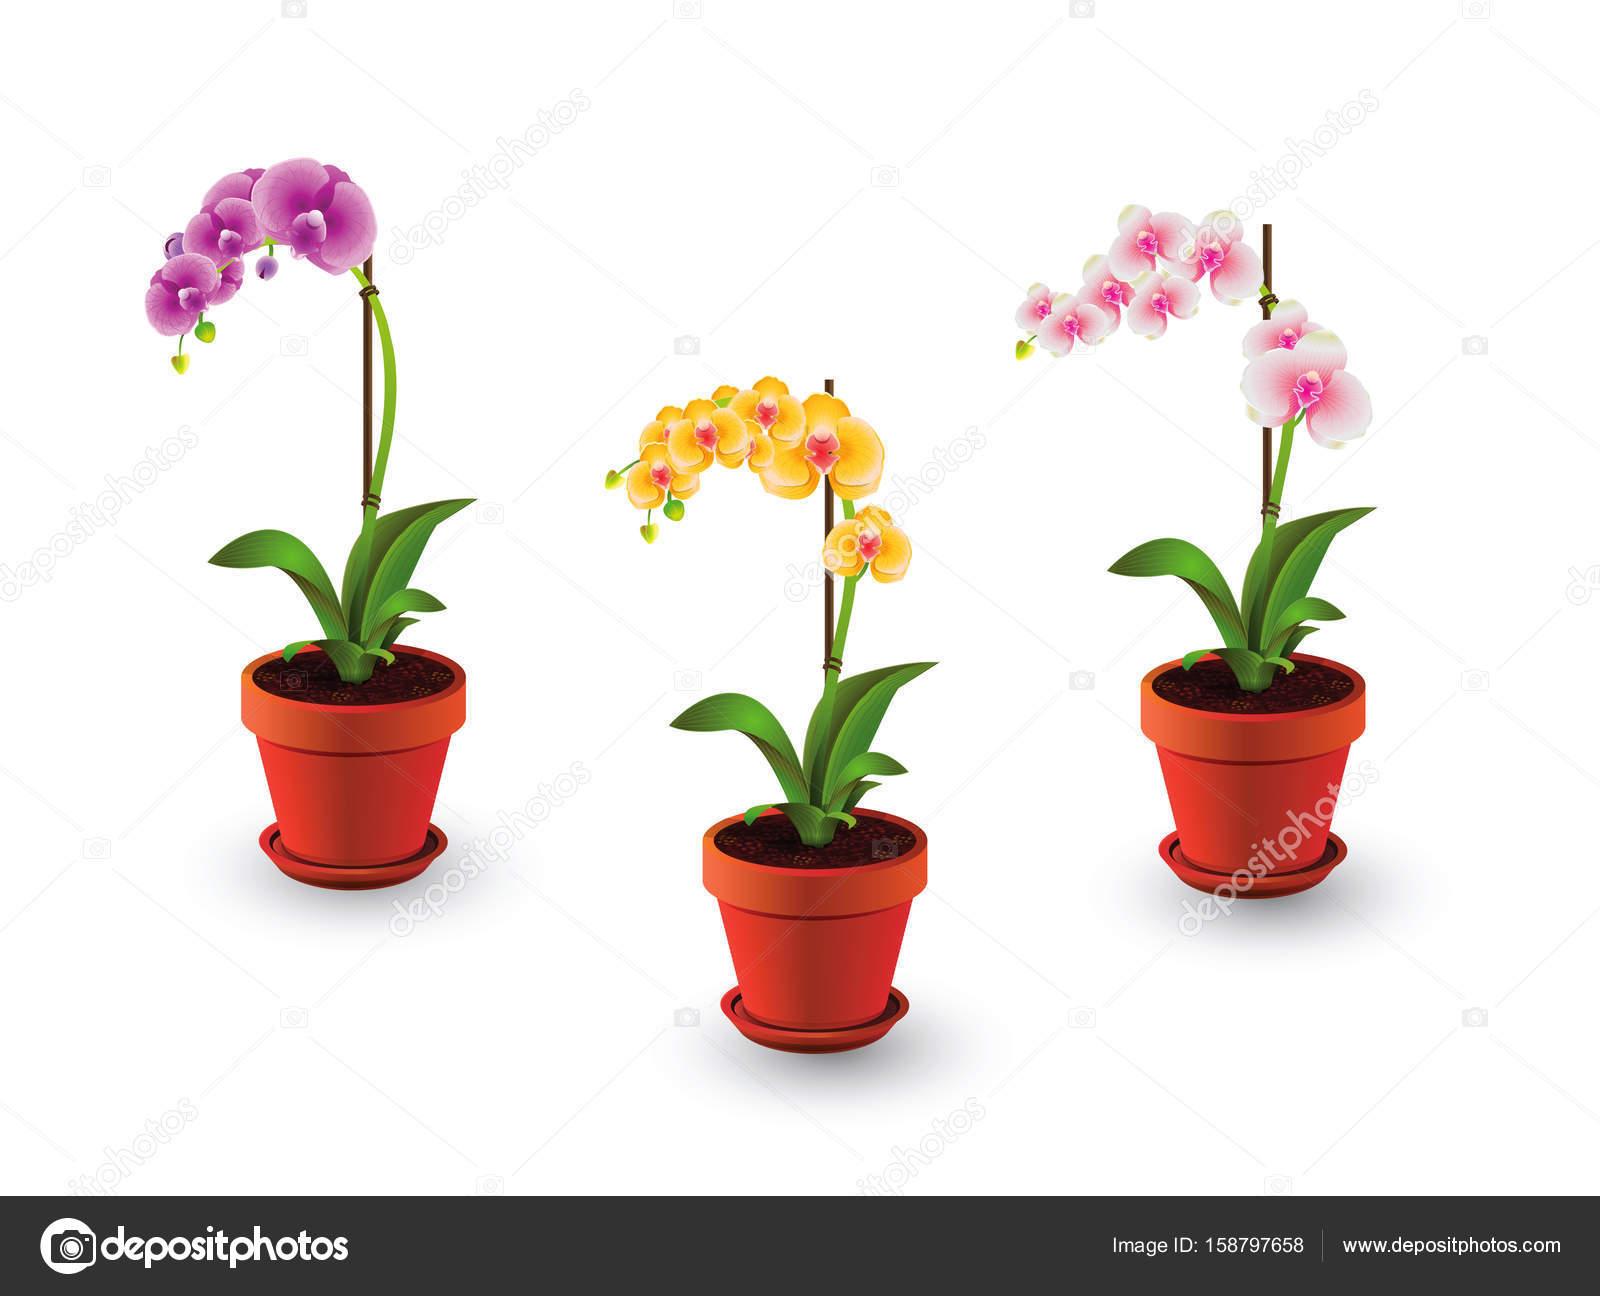 tsvetok-orhidei-v-gorshke